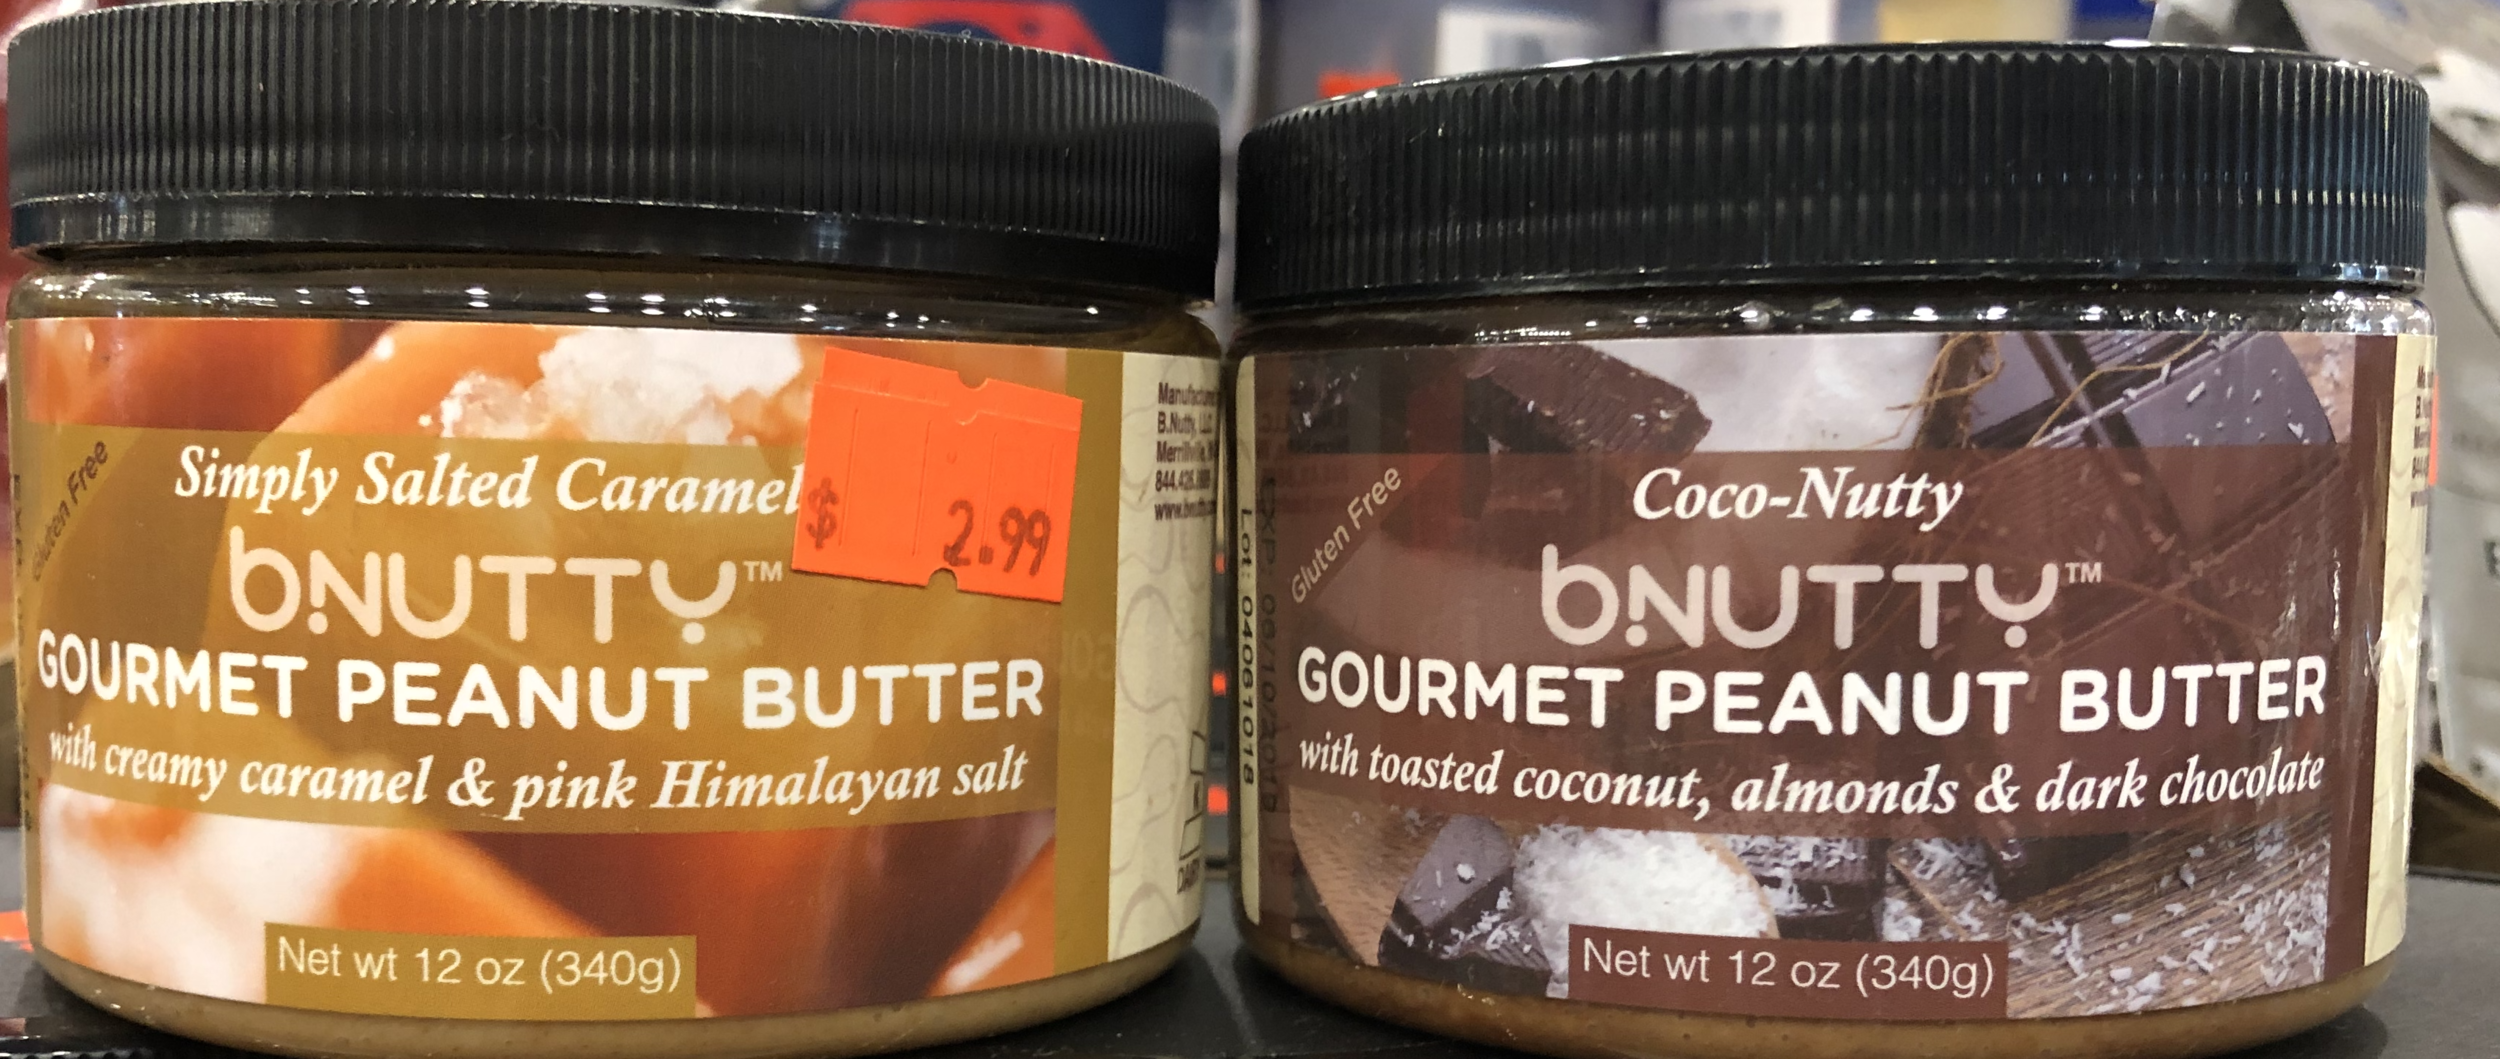 bnutty Gourmet Peanut Butter - Creamy Caramel & Pink Himalayan Salt; Toasted Coconut, Almonds & Dark Chocolate